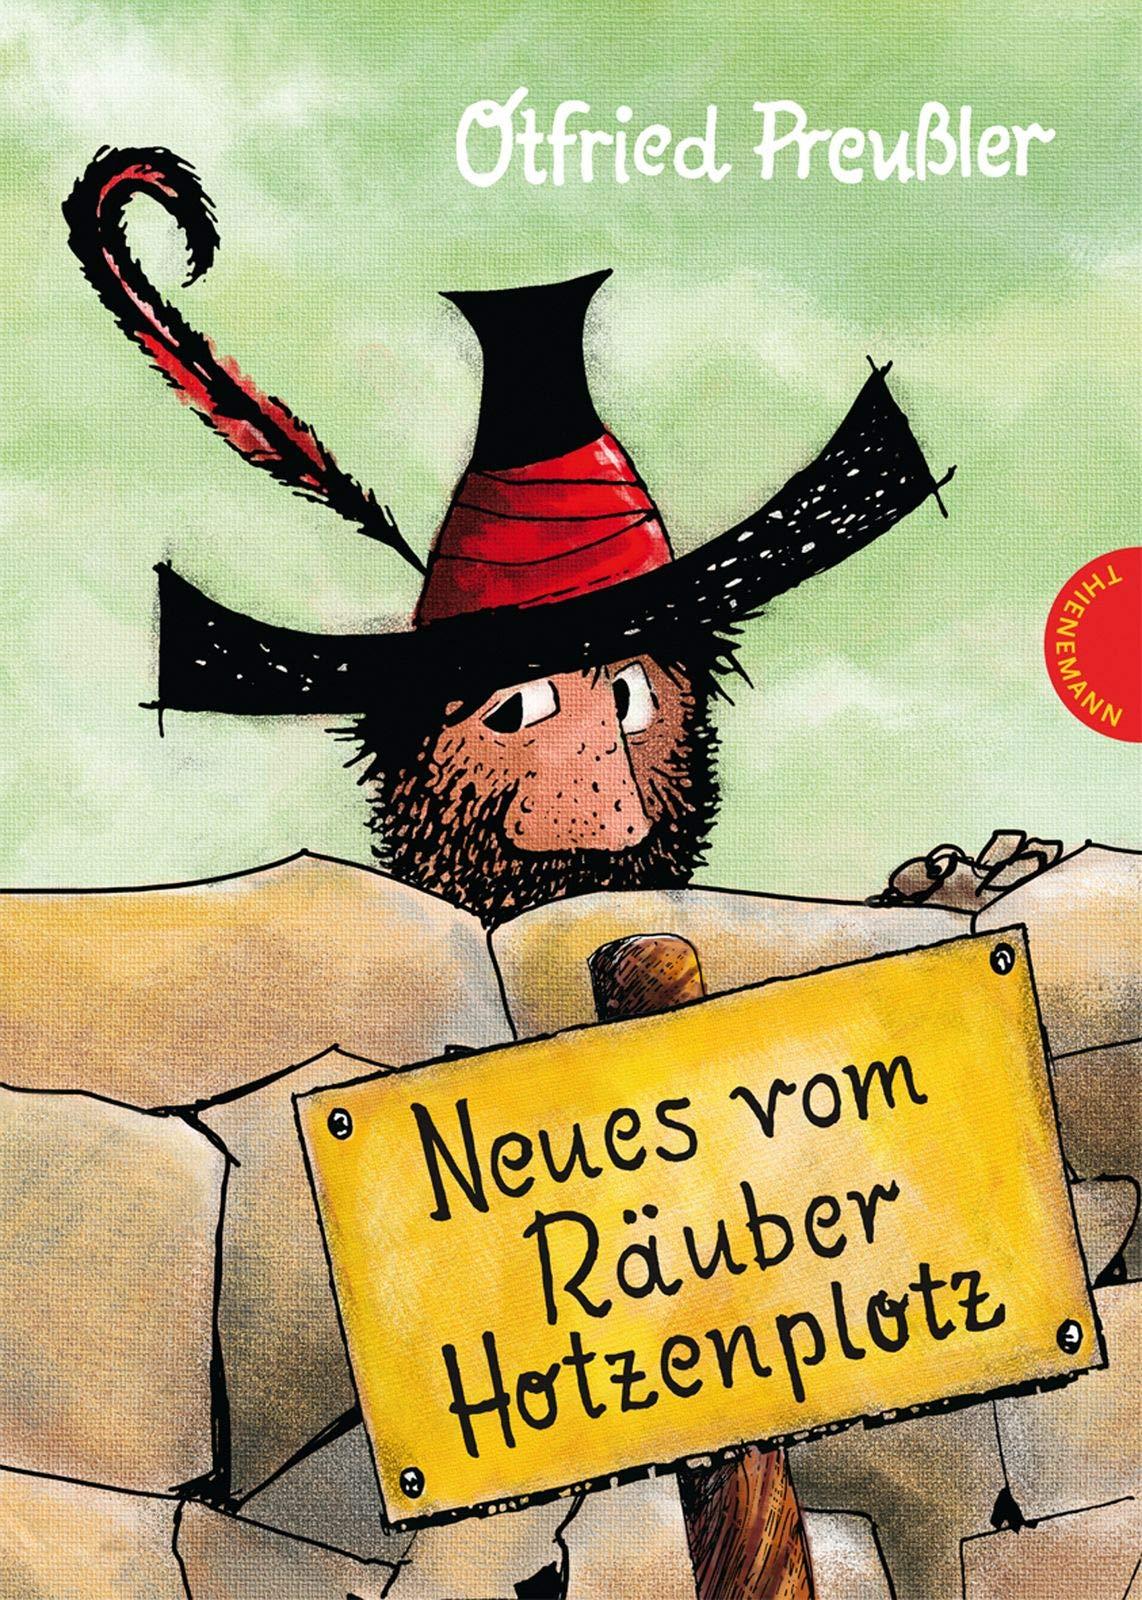 Neues Vom Räuber Hotzenplotz  Bd. 2 Koloriert   Der Räuber Hotzenplotz Band 2